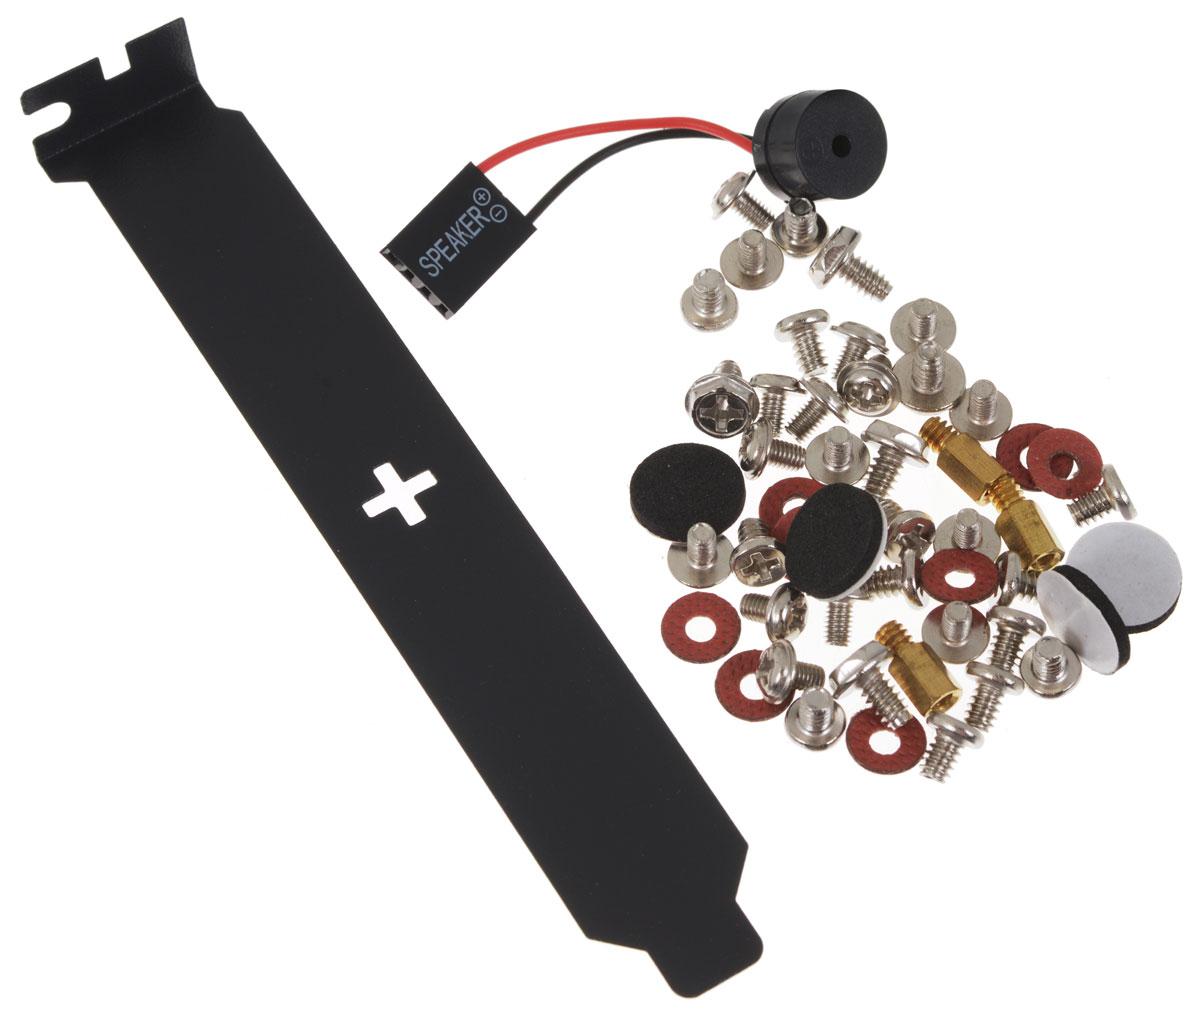 GMC Smart, Black компьютерный корпус